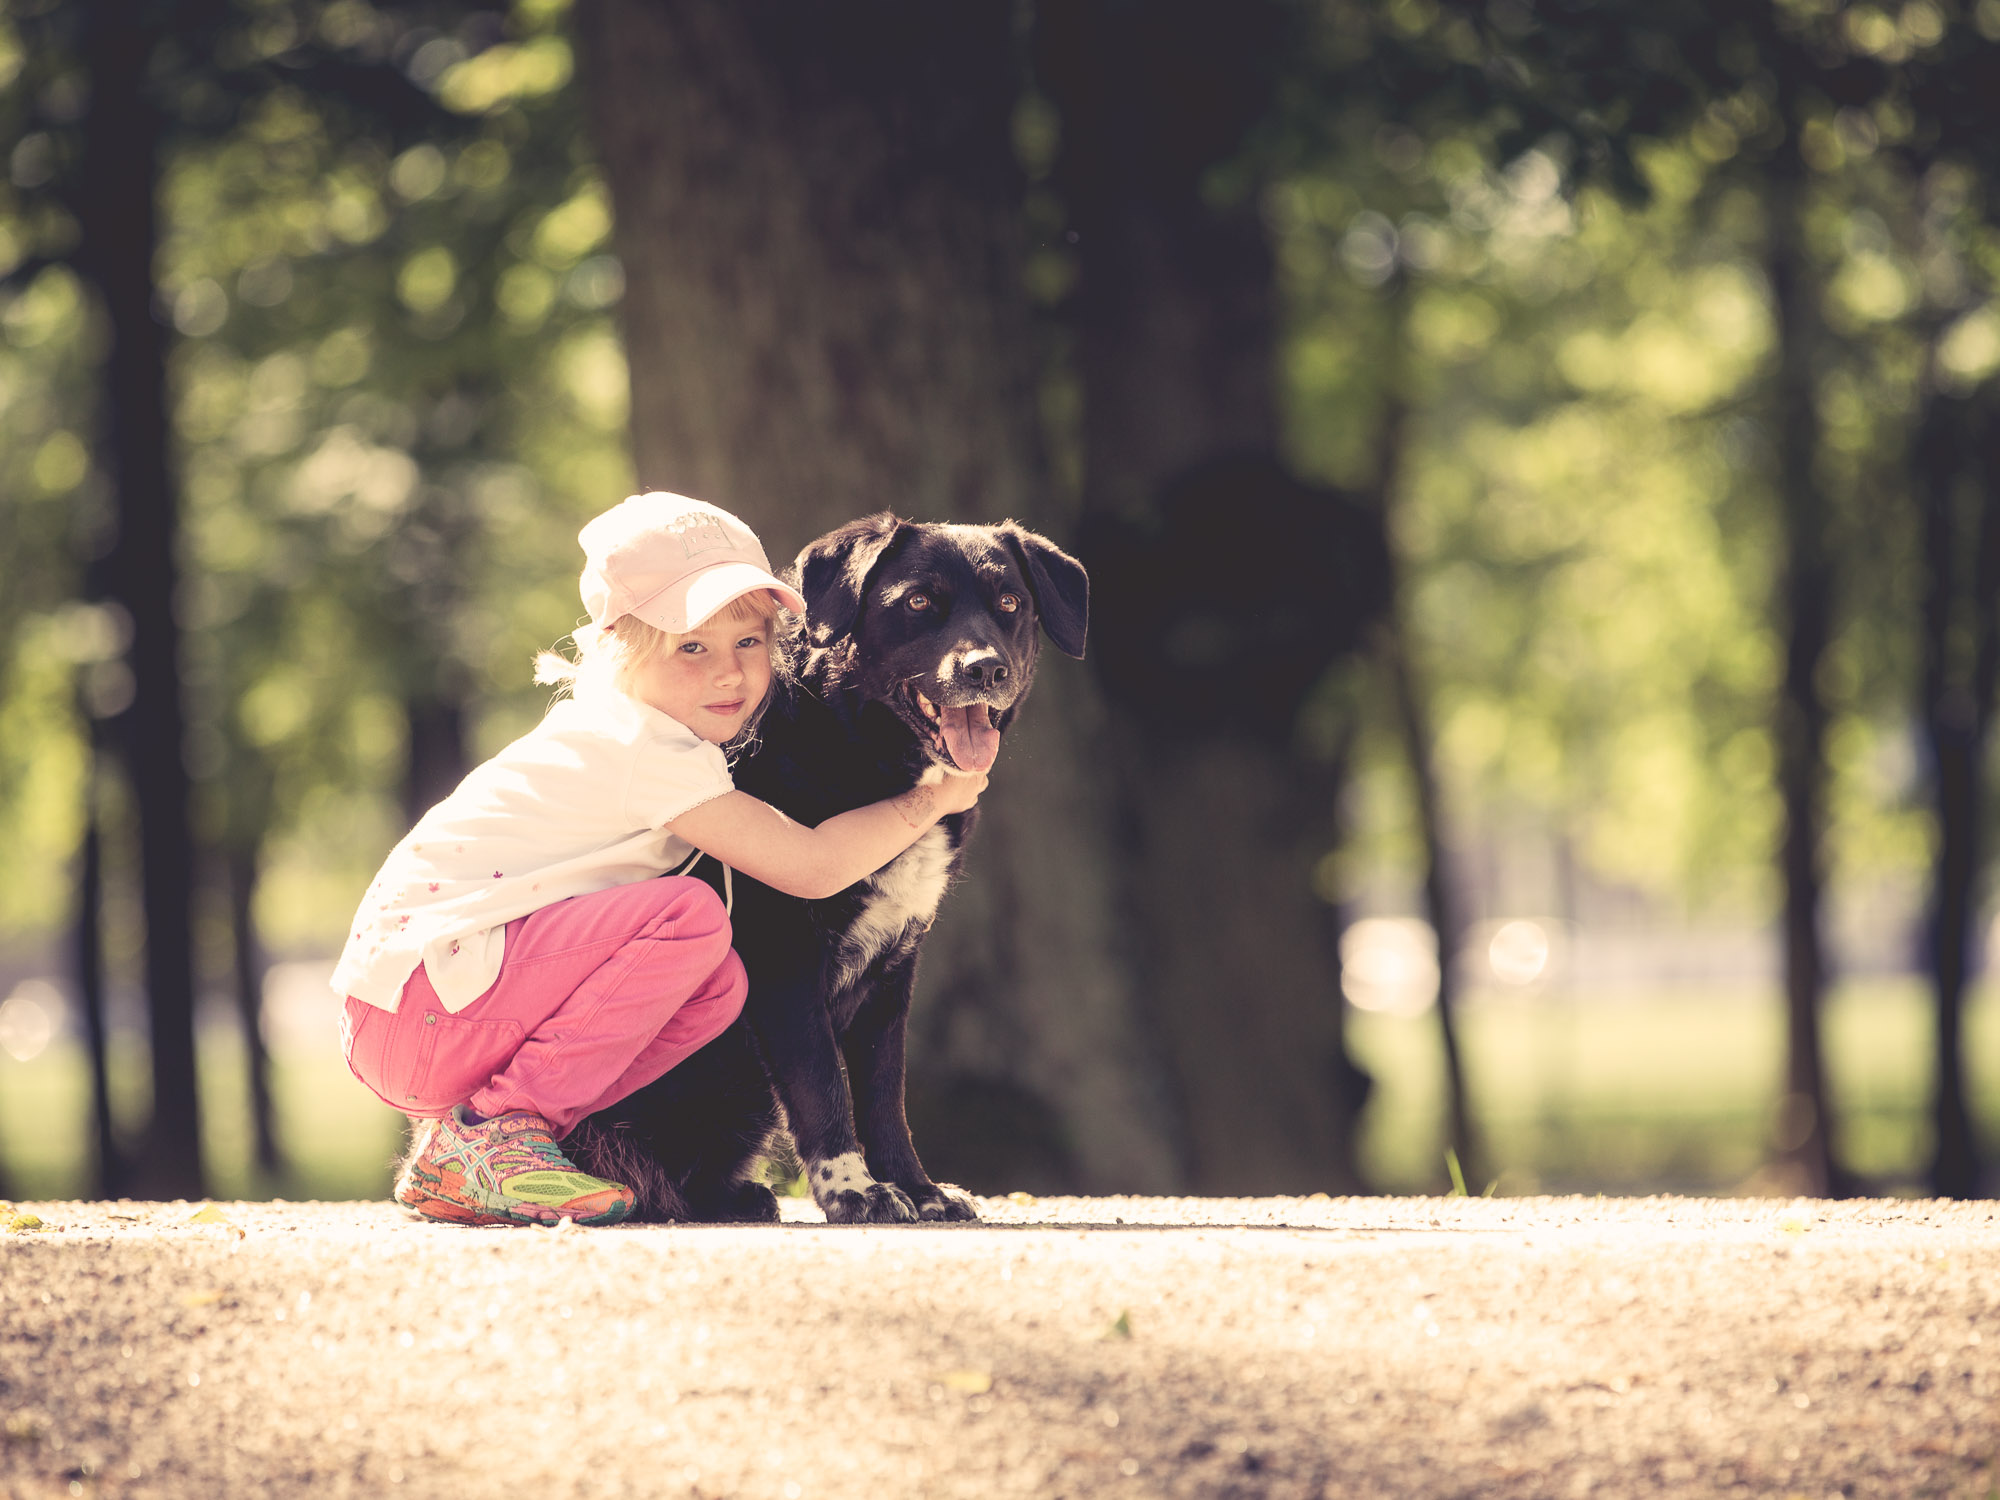 hund-hundefotograf-hundefotografering-fotograf-hodnedesign-pål-hodne--48.jpg